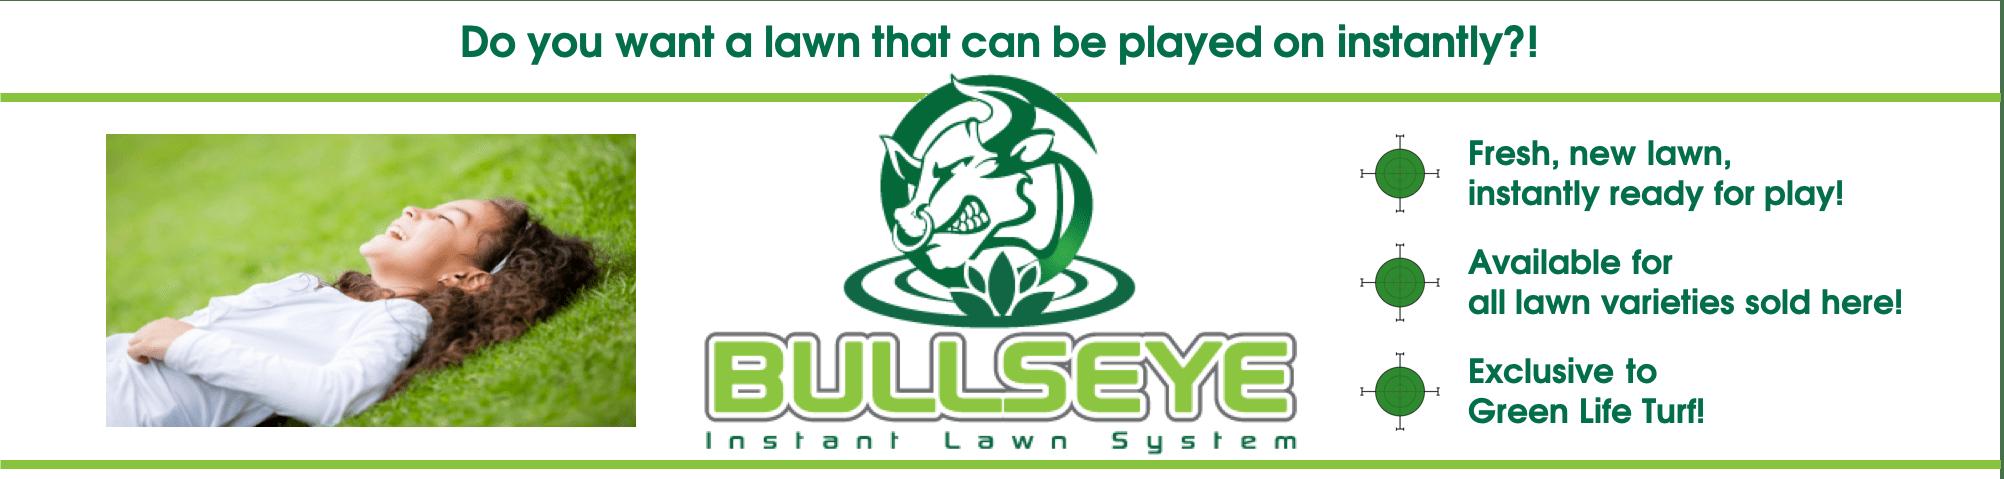 Bullseye Instant Real Lawn